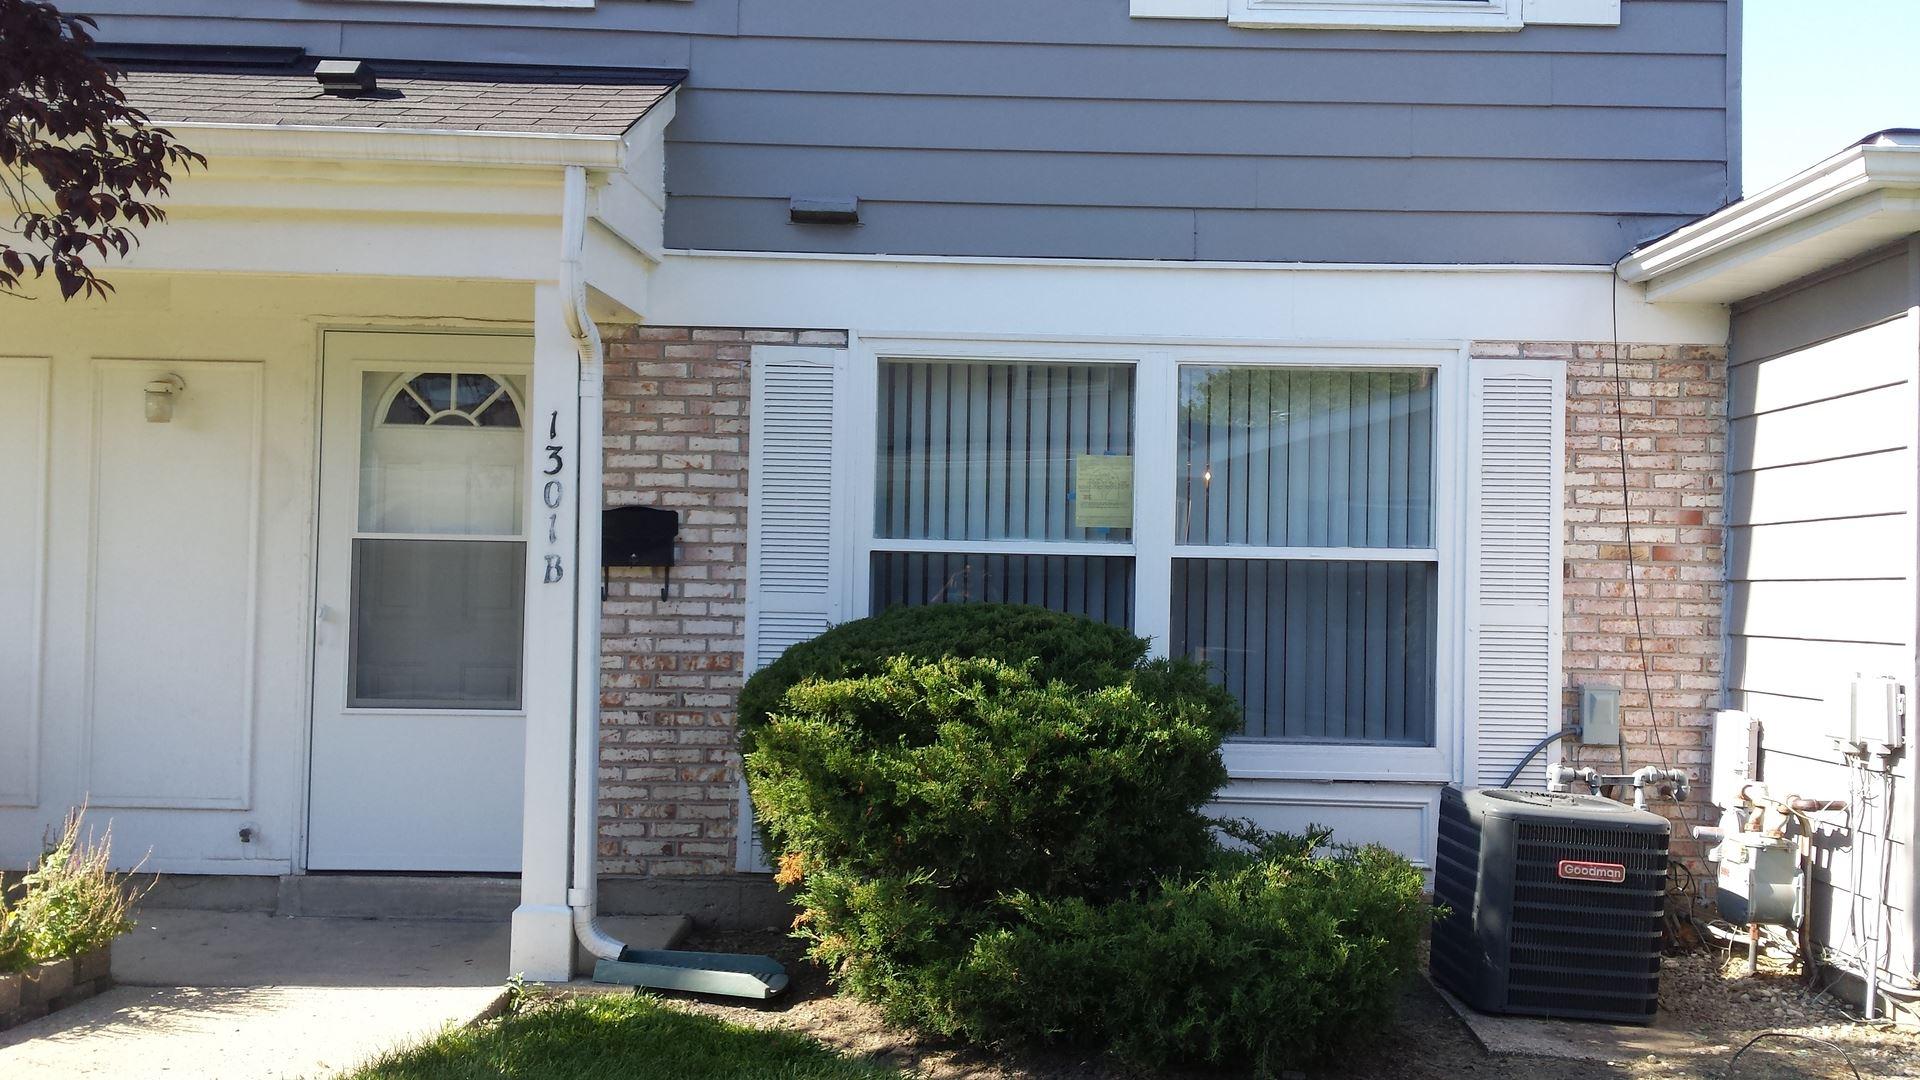 1301 Kingsbury Drive #B, Hanover Park, IL 60133 - #: 10771953